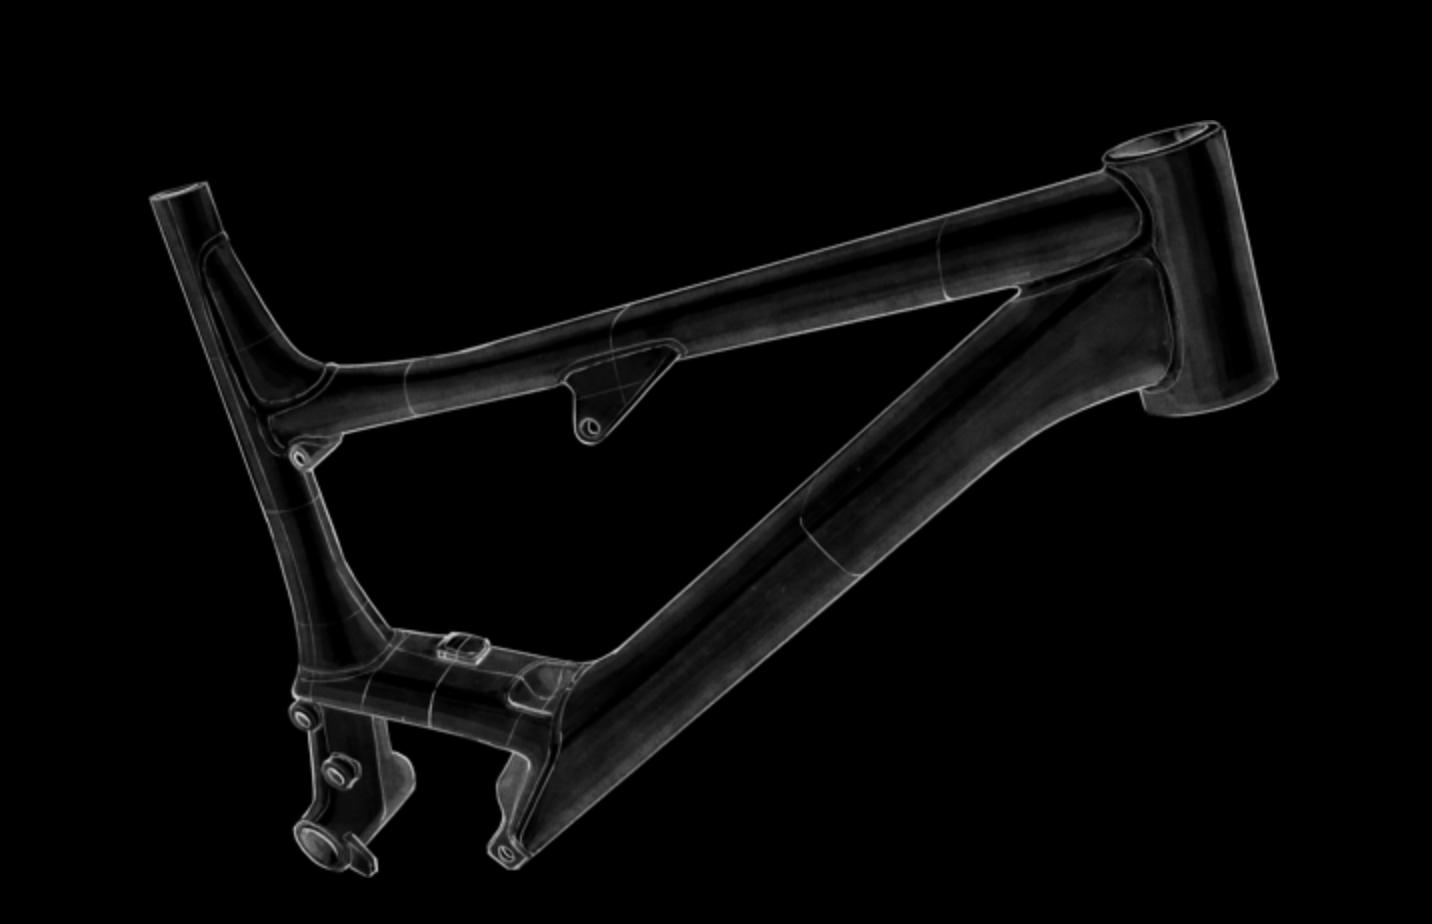 Rocky Mountain Instinct Powerplay Alloy 70 BC Edition e-Bike - 2021